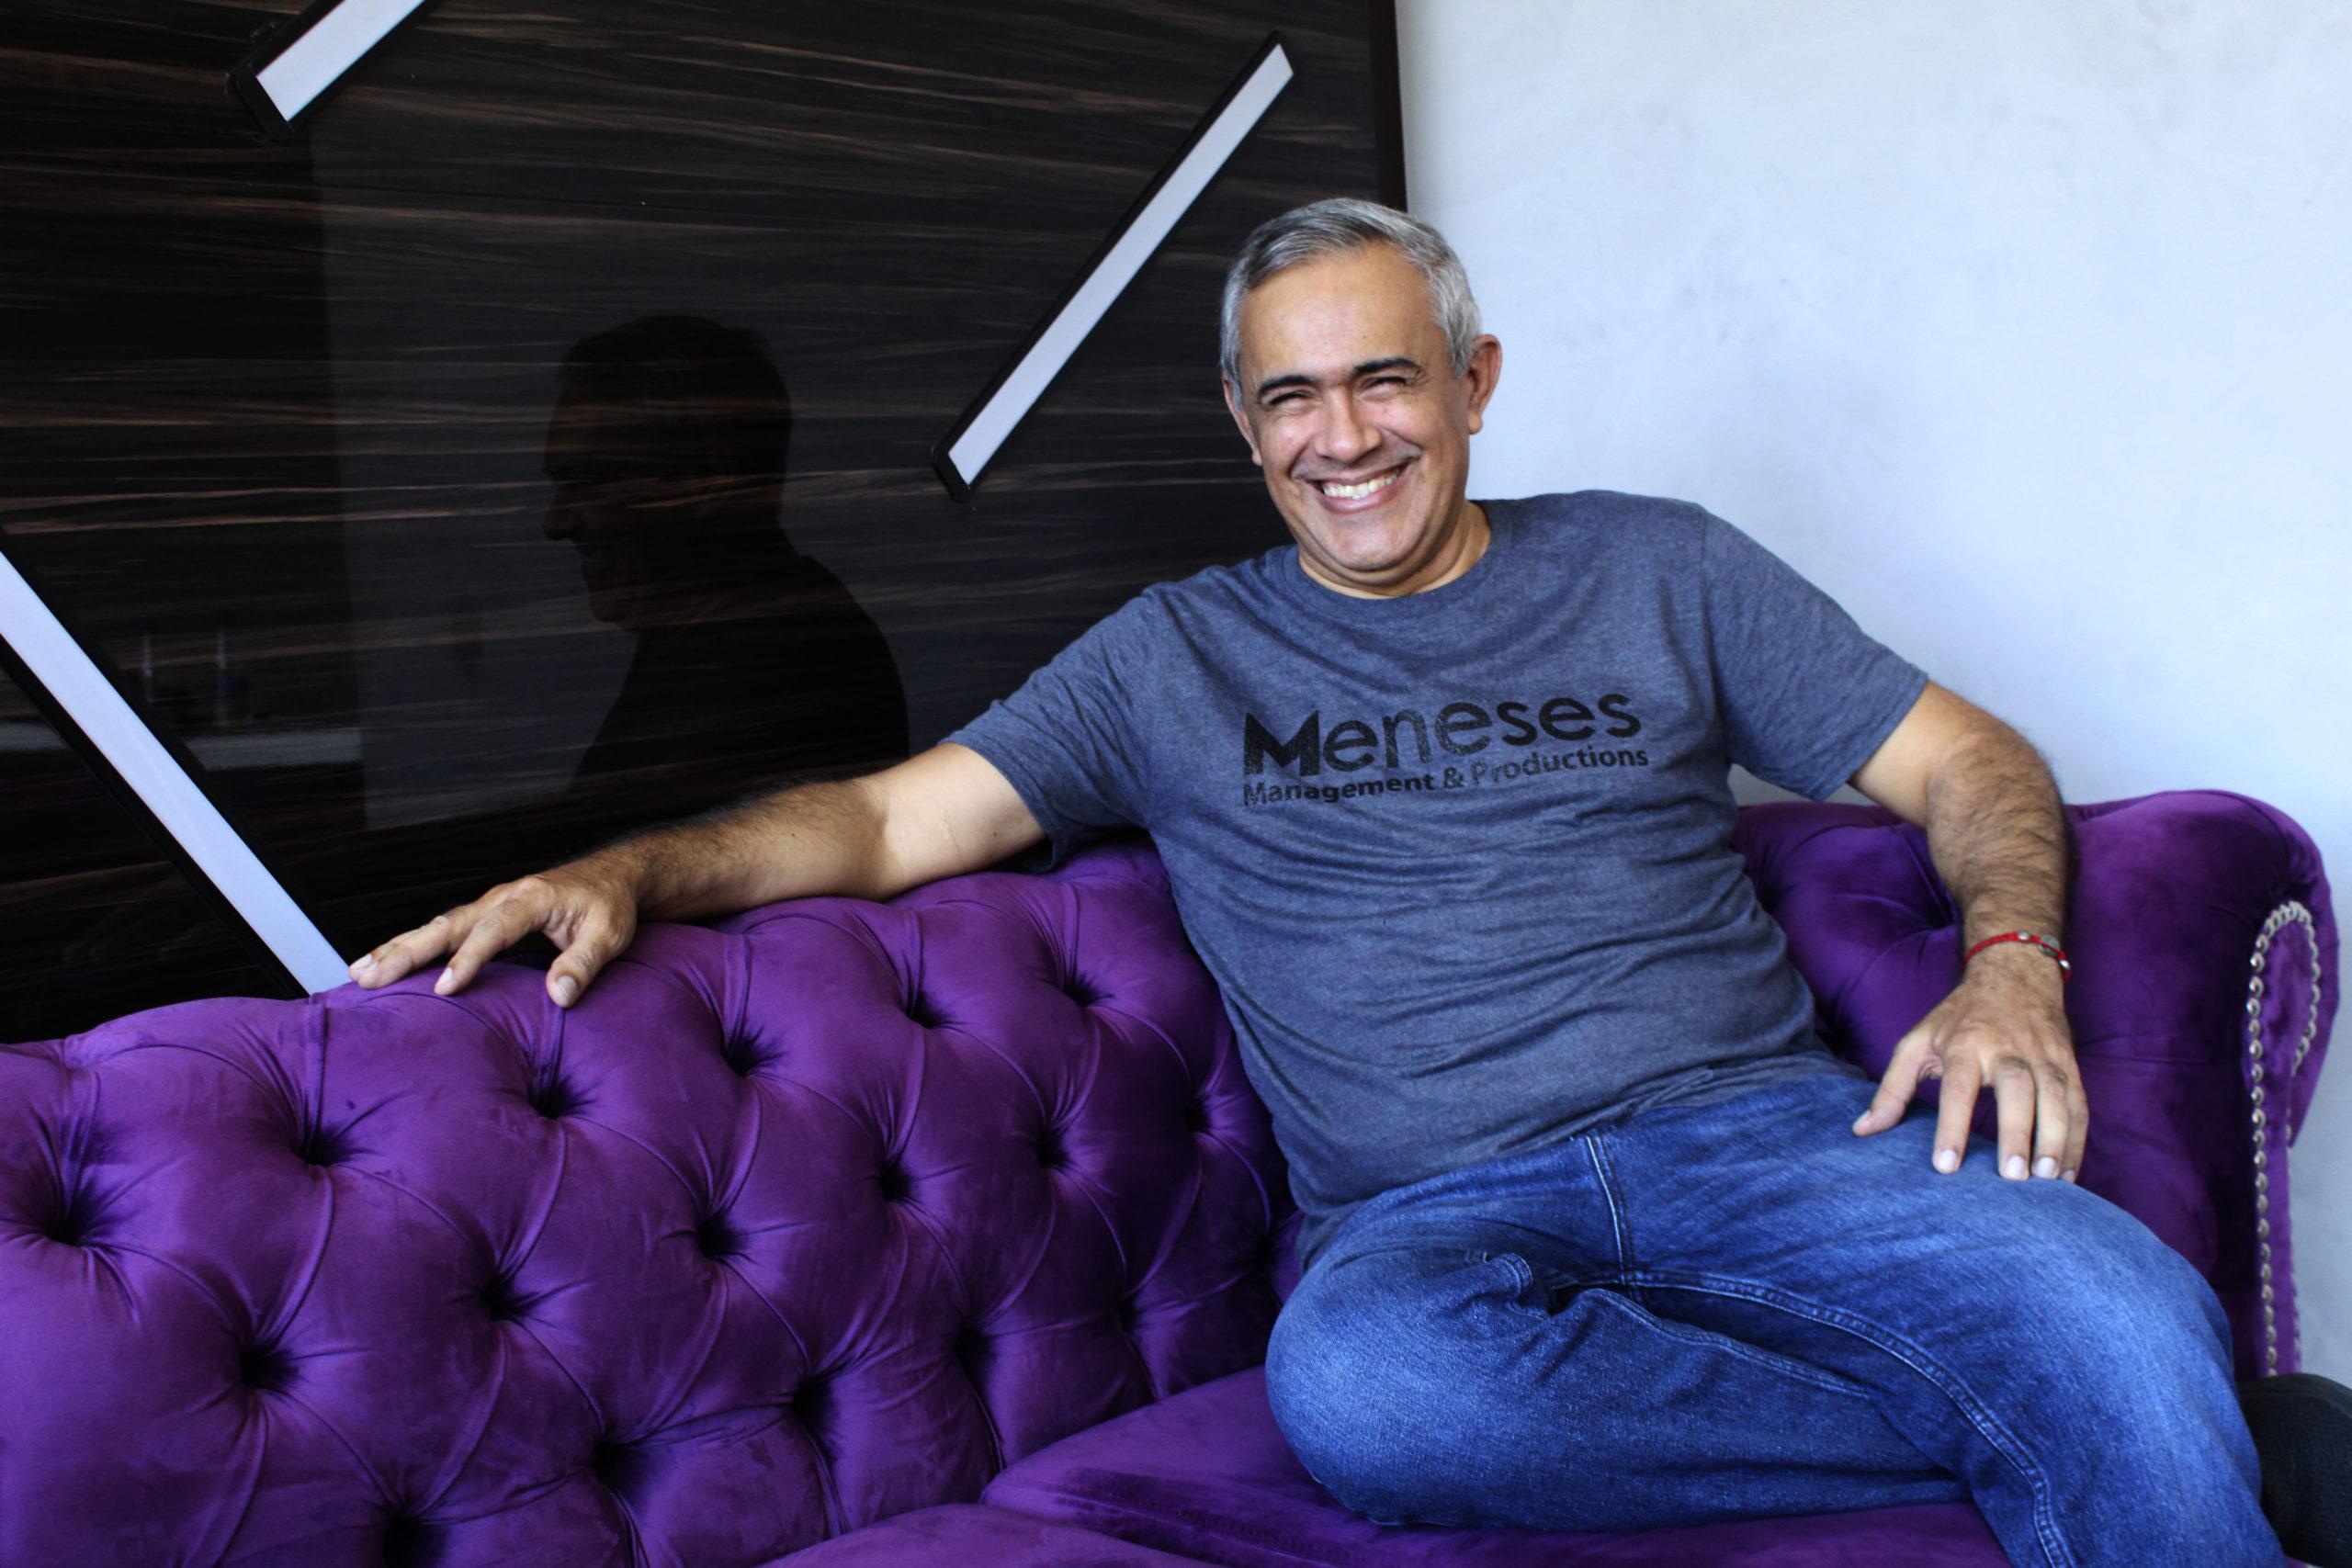 Meneses and Friends 2021 se une al Medellín Music Week 2021